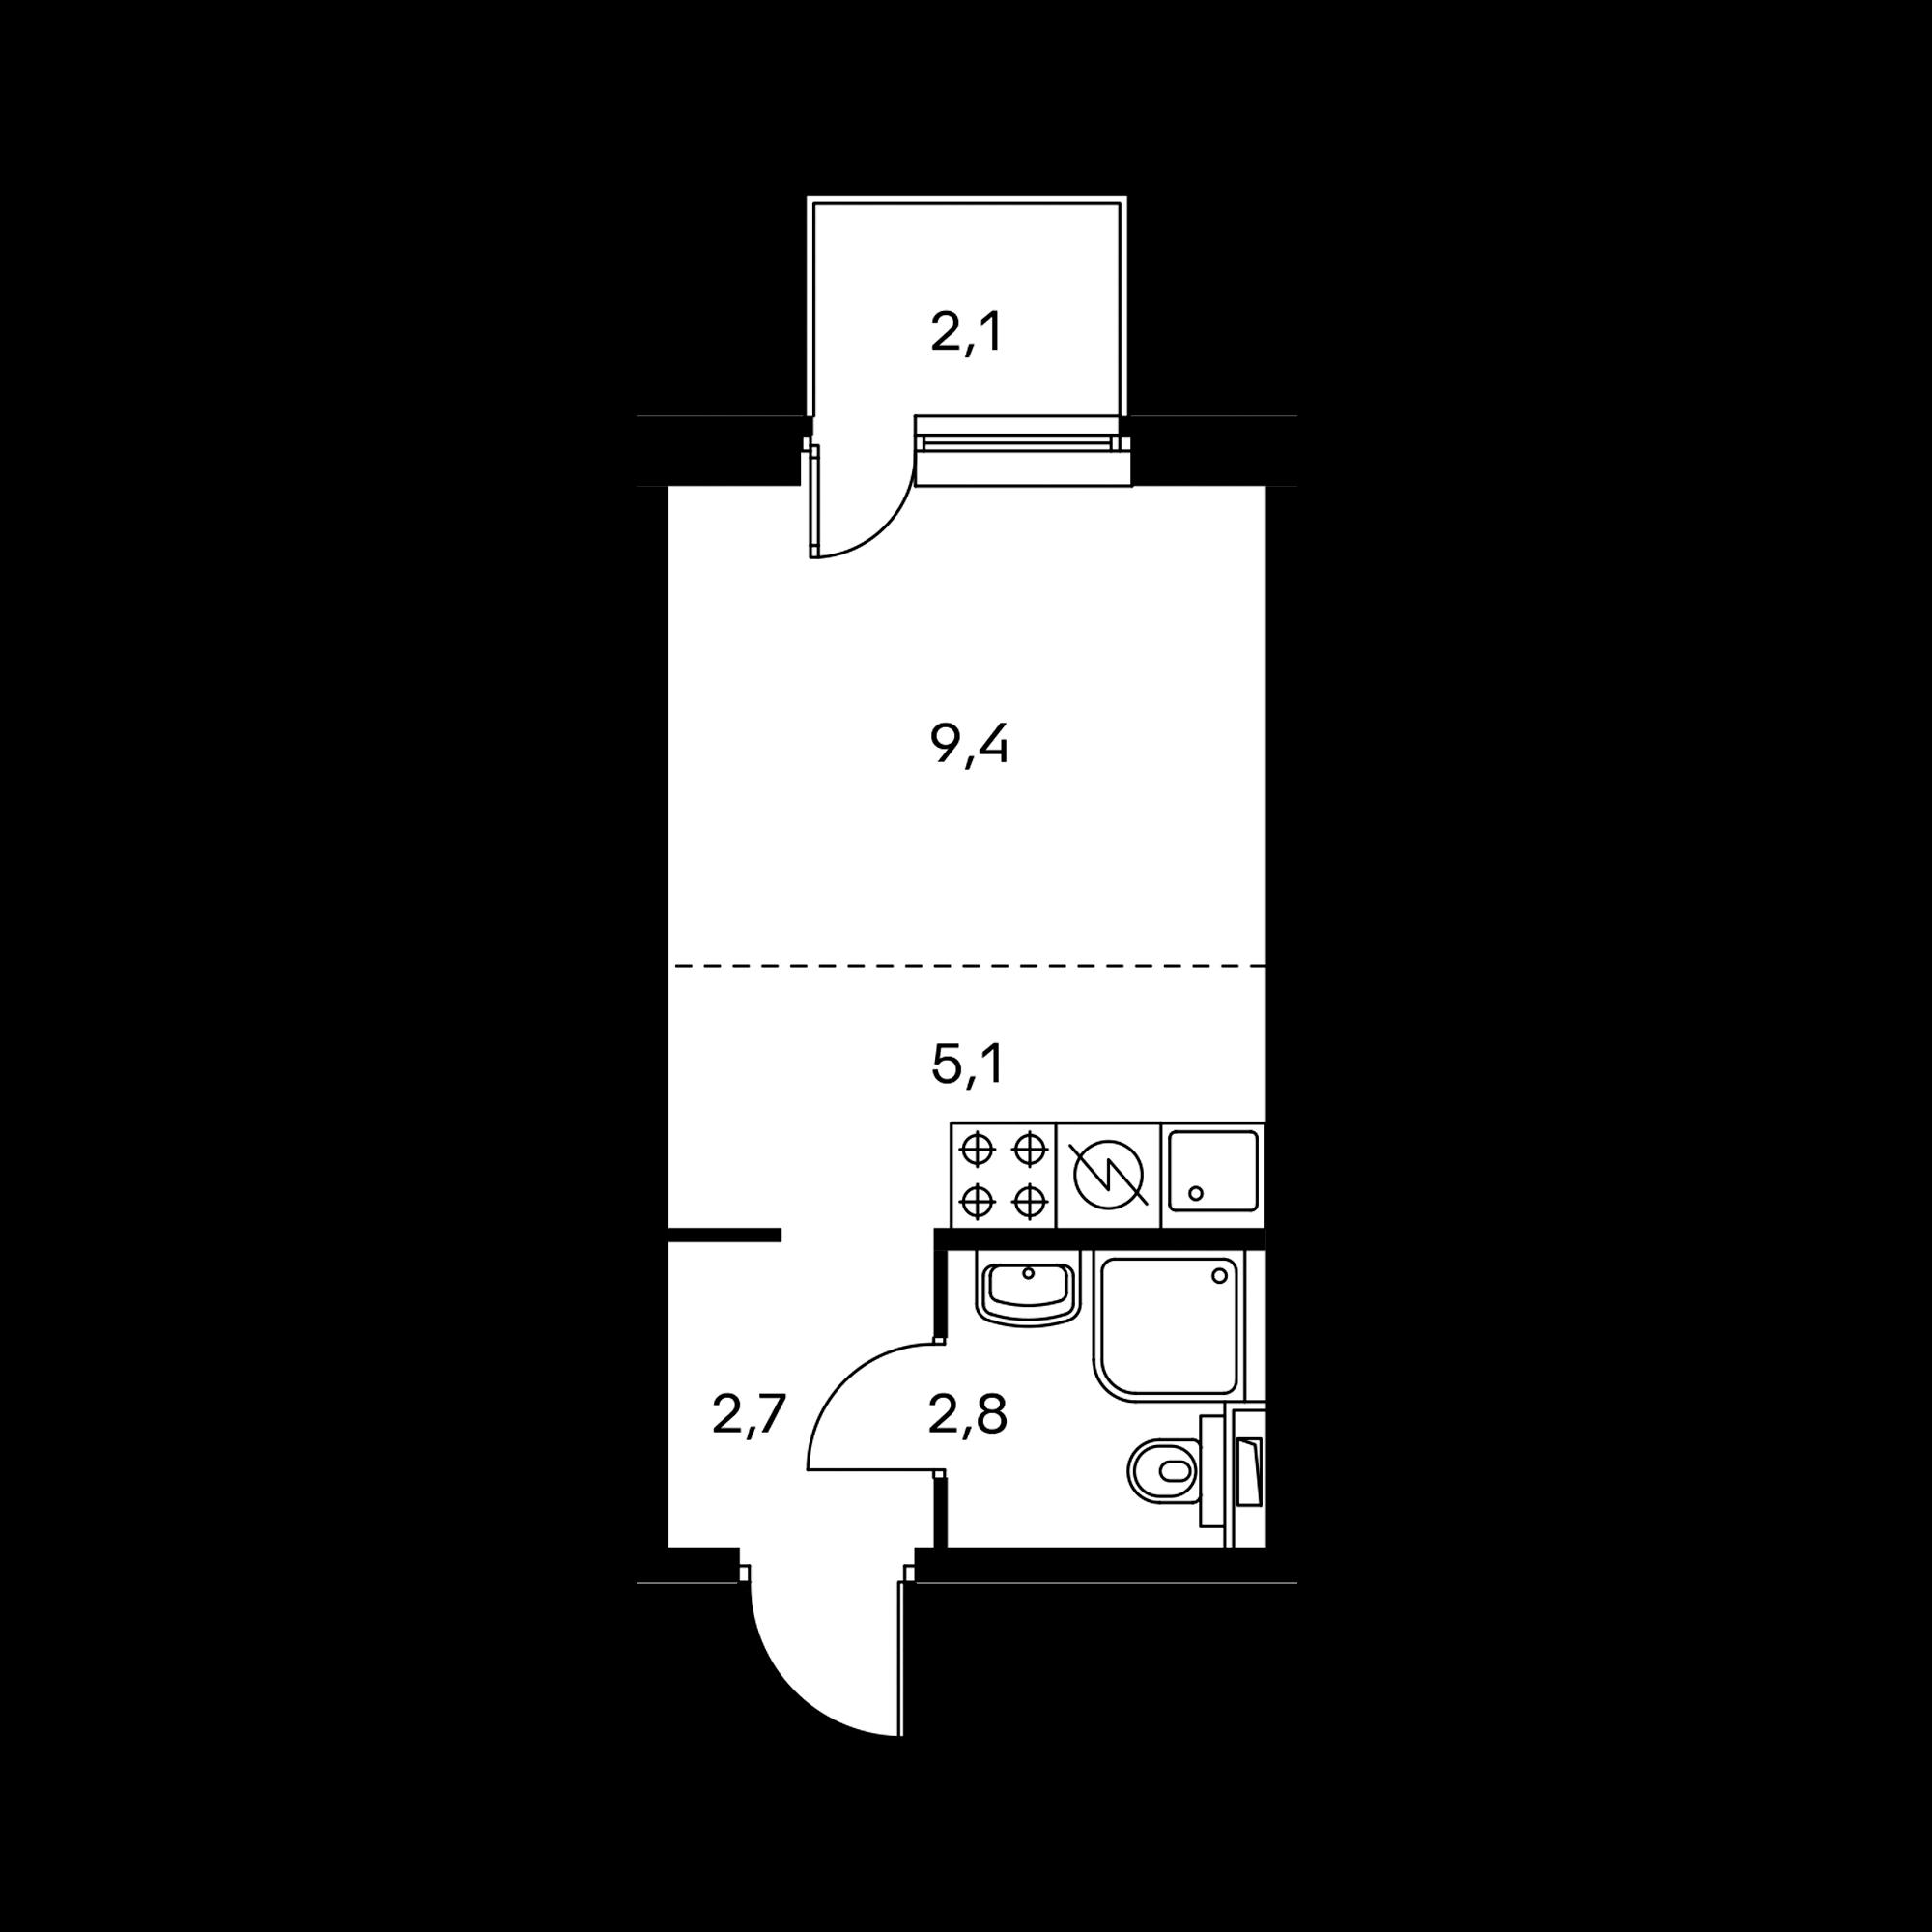 1NS1_3.6-1_B